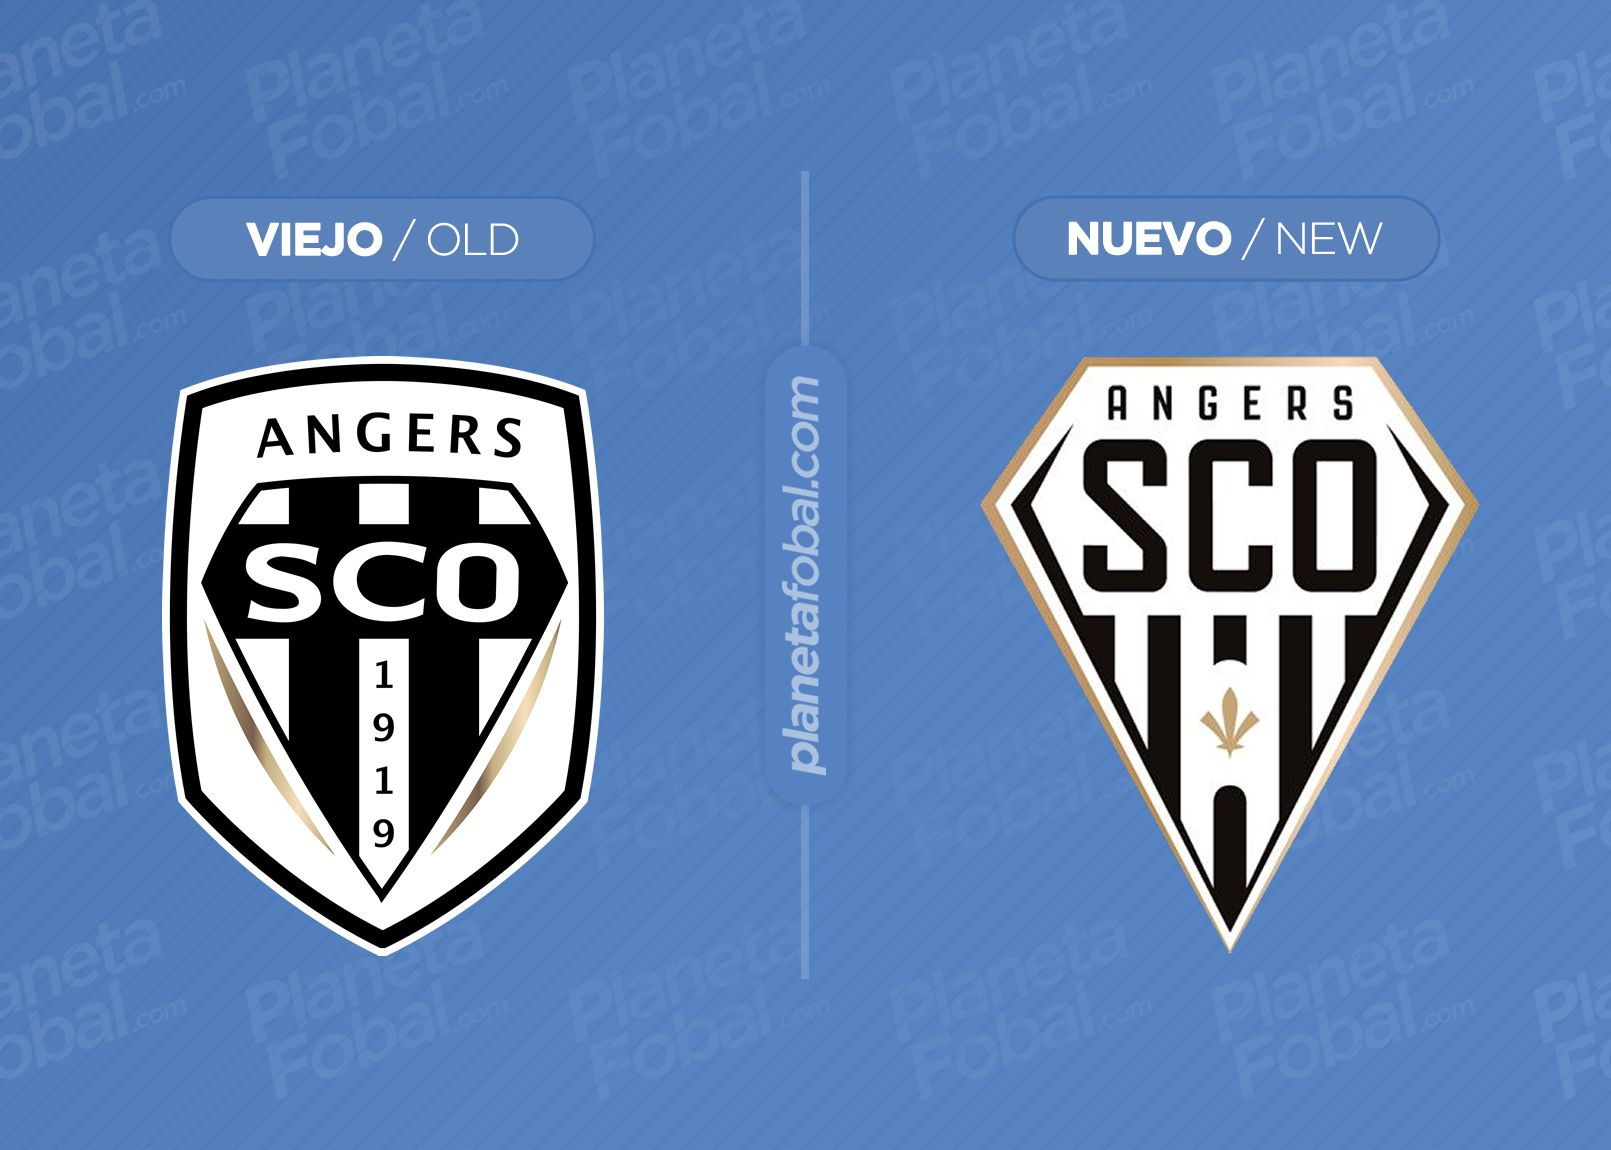 Angers SCO presenta su nuevo escudo oficial